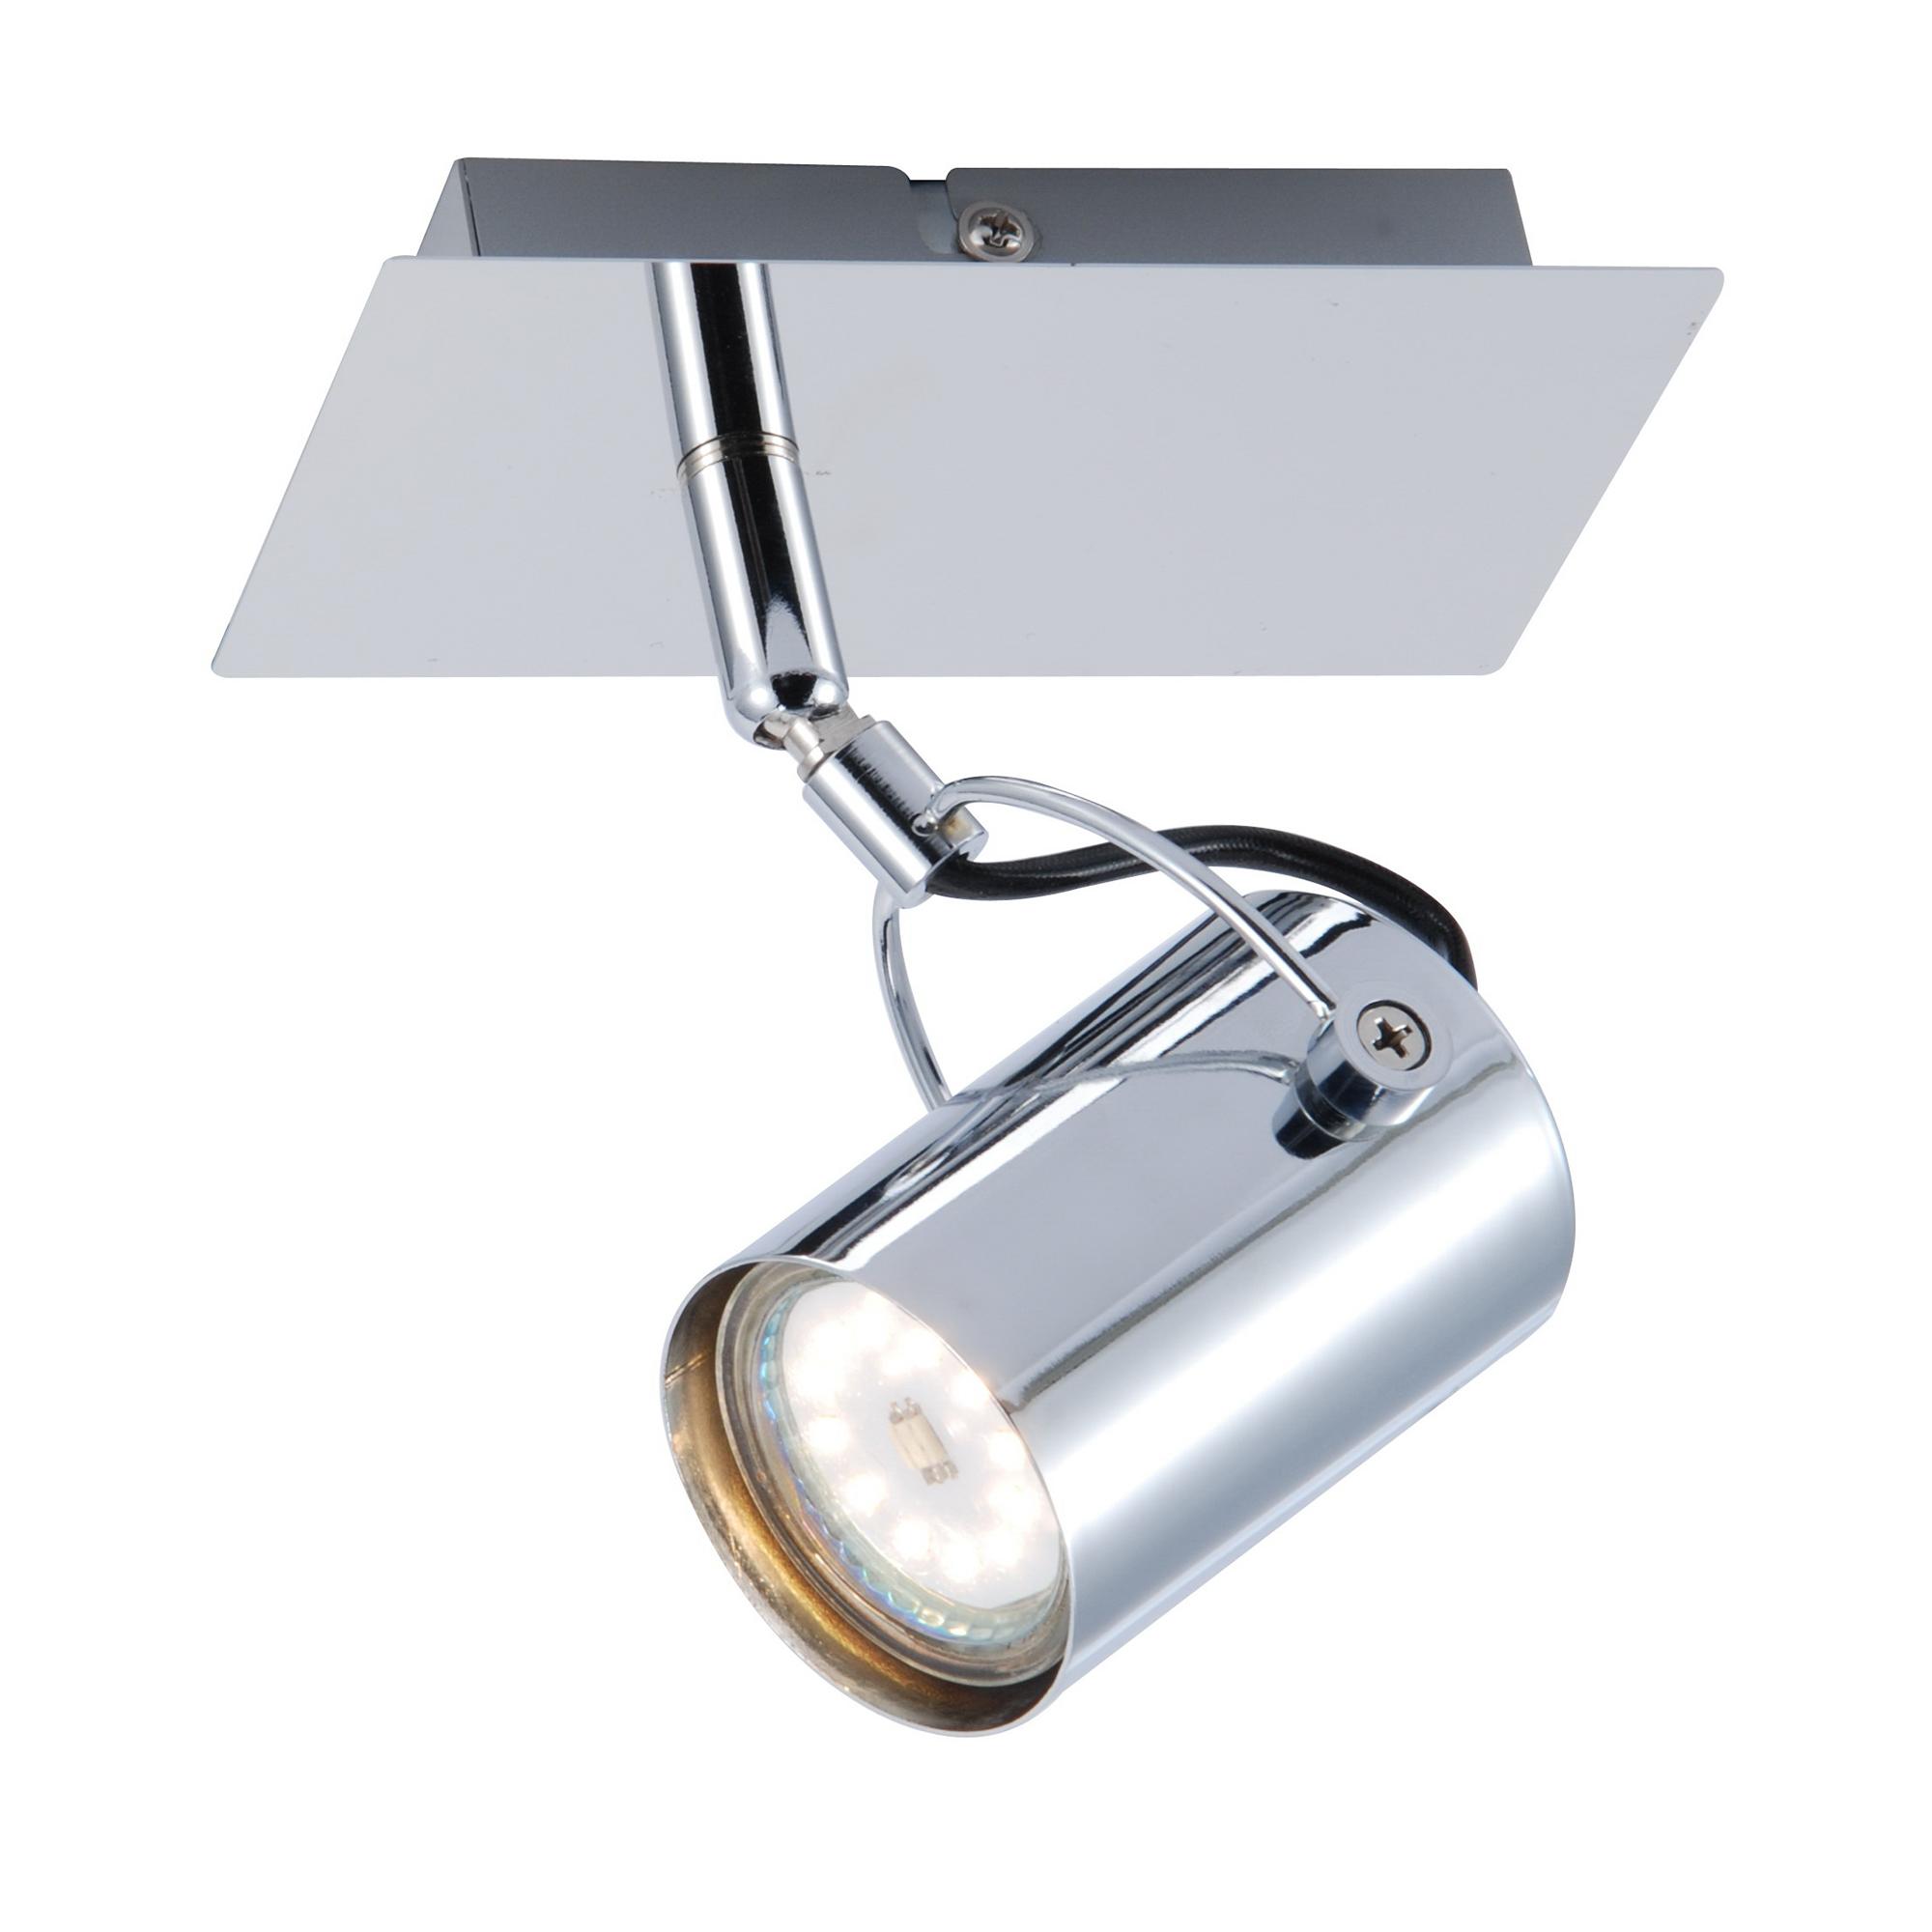 Спот J-light SABI 1223/1A GU10*1*35W хром/хром спот j light damon 1410 1a gu10 1 35w хром хром